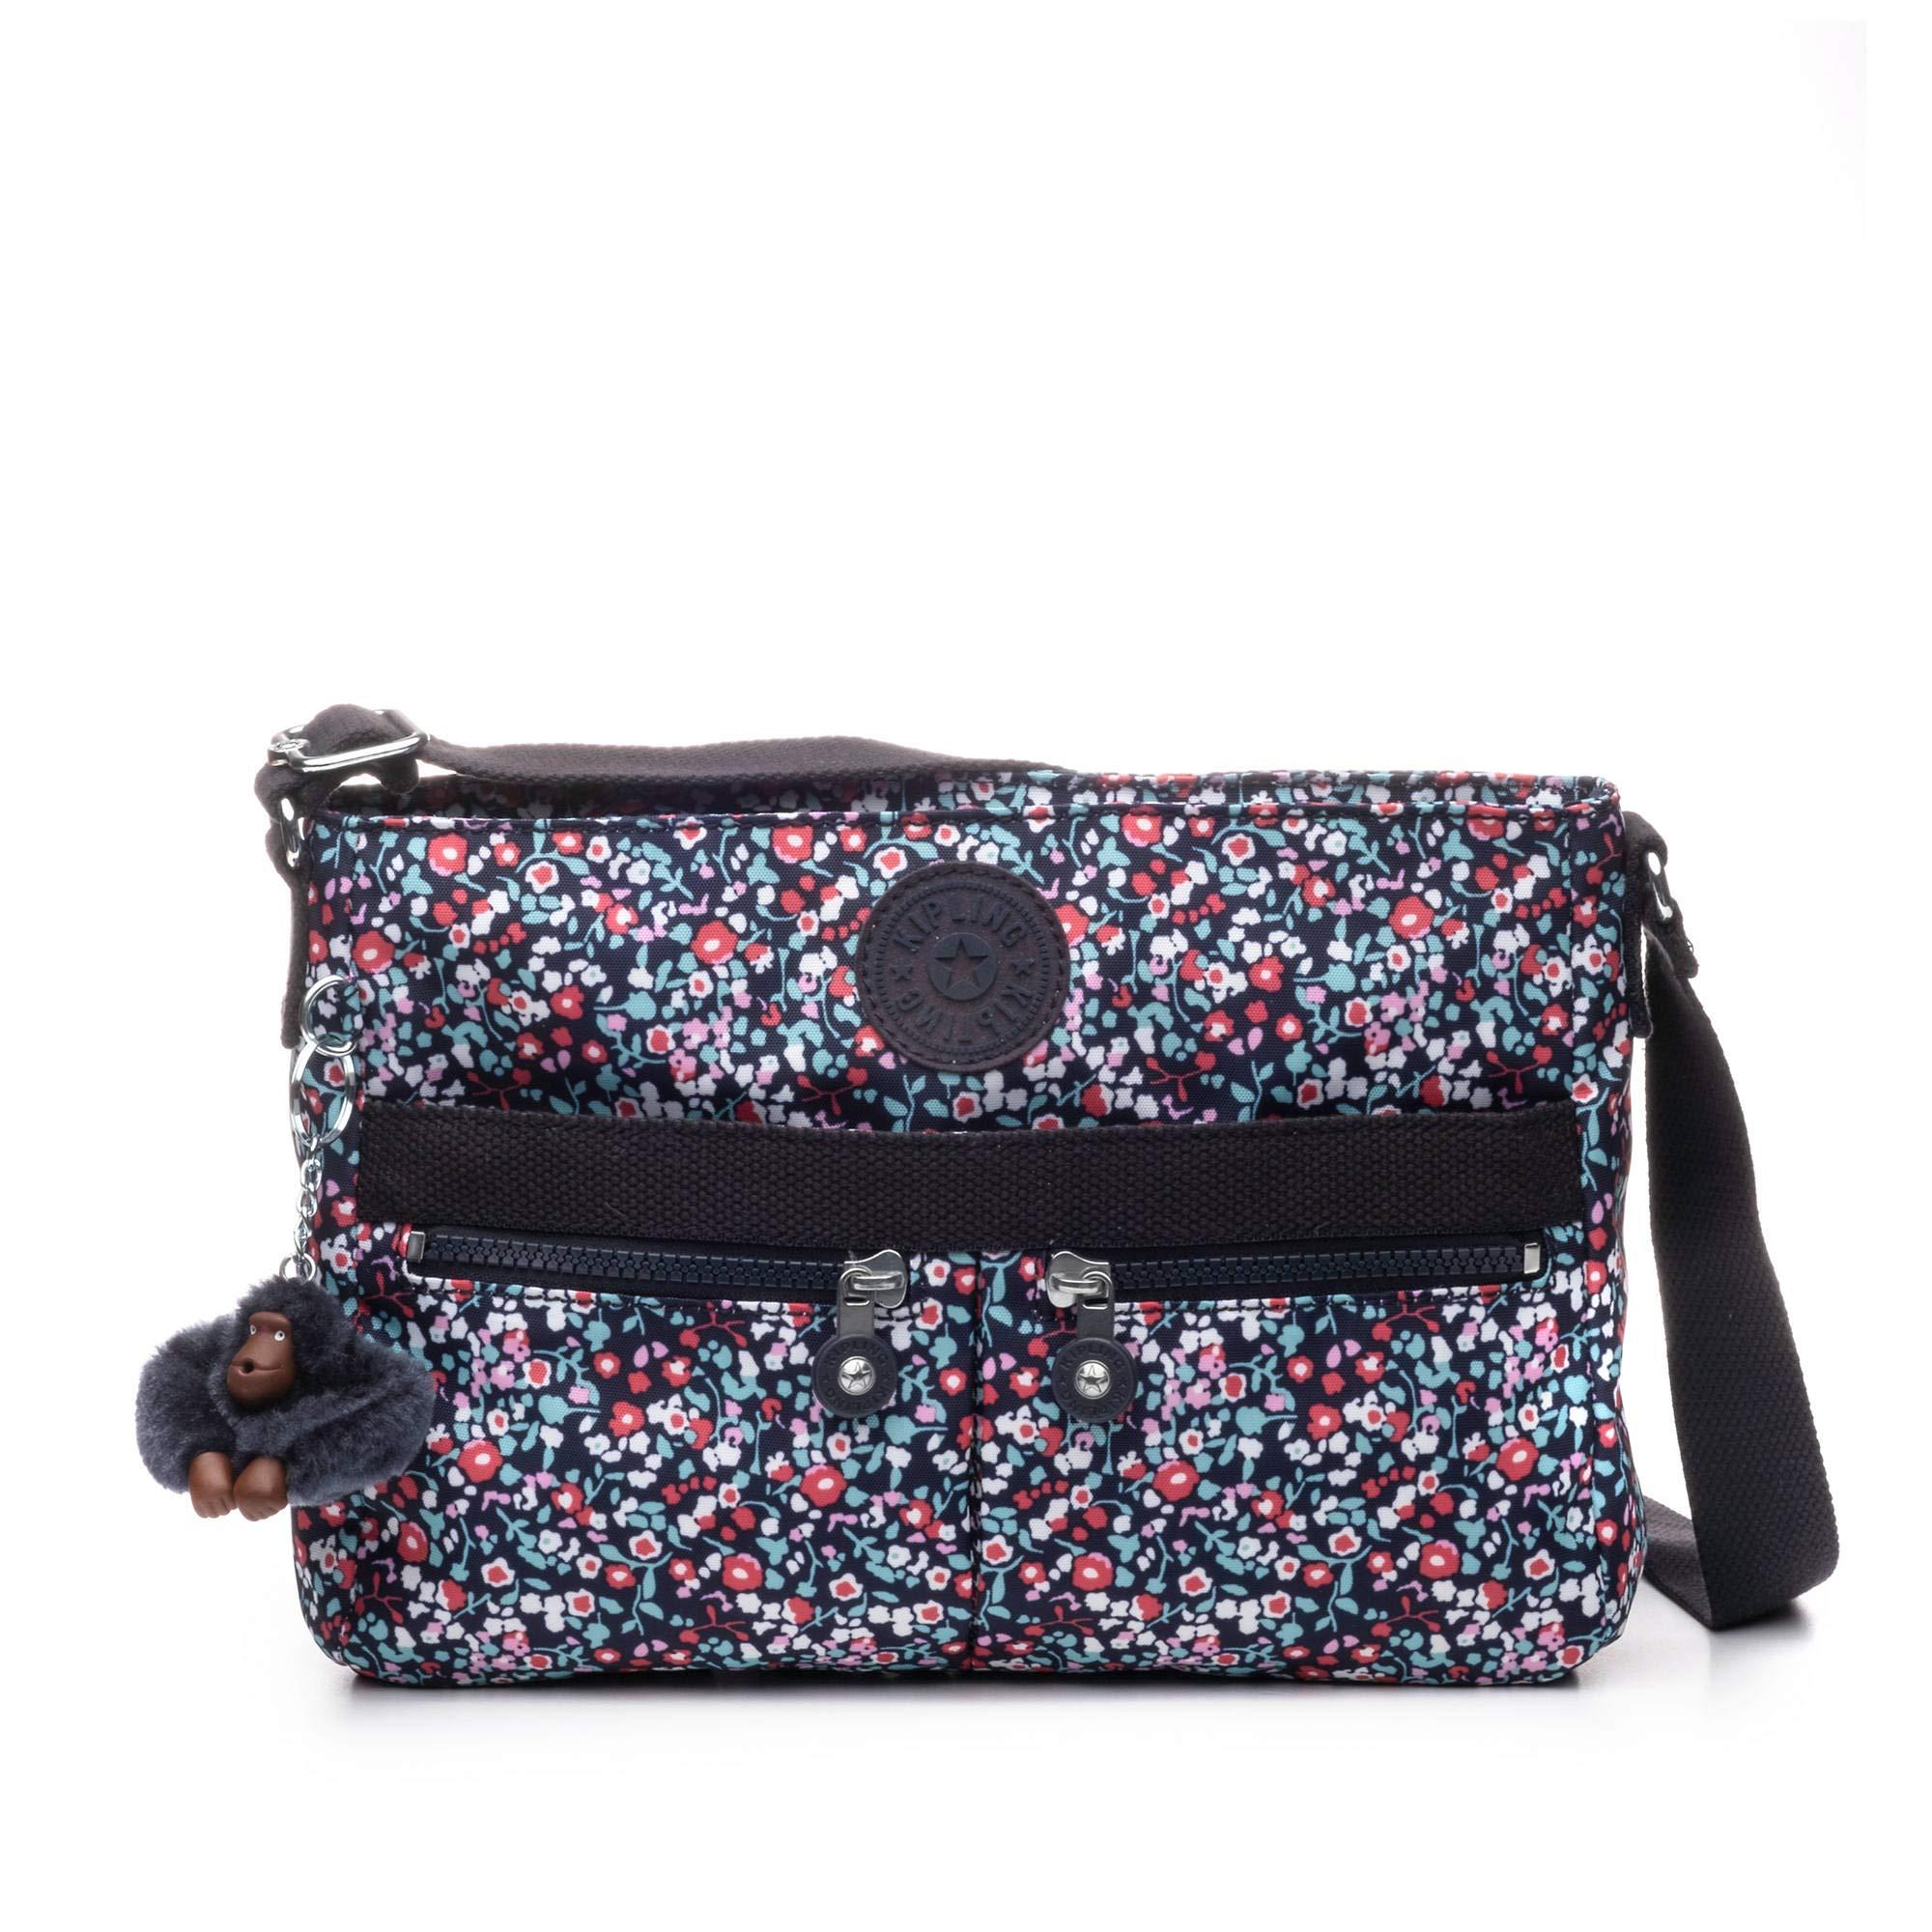 Kipling Women's Angie Crossbody Bag, Adjustable Shoulder Strap, Zip Closure, Glistening Poppy Blue